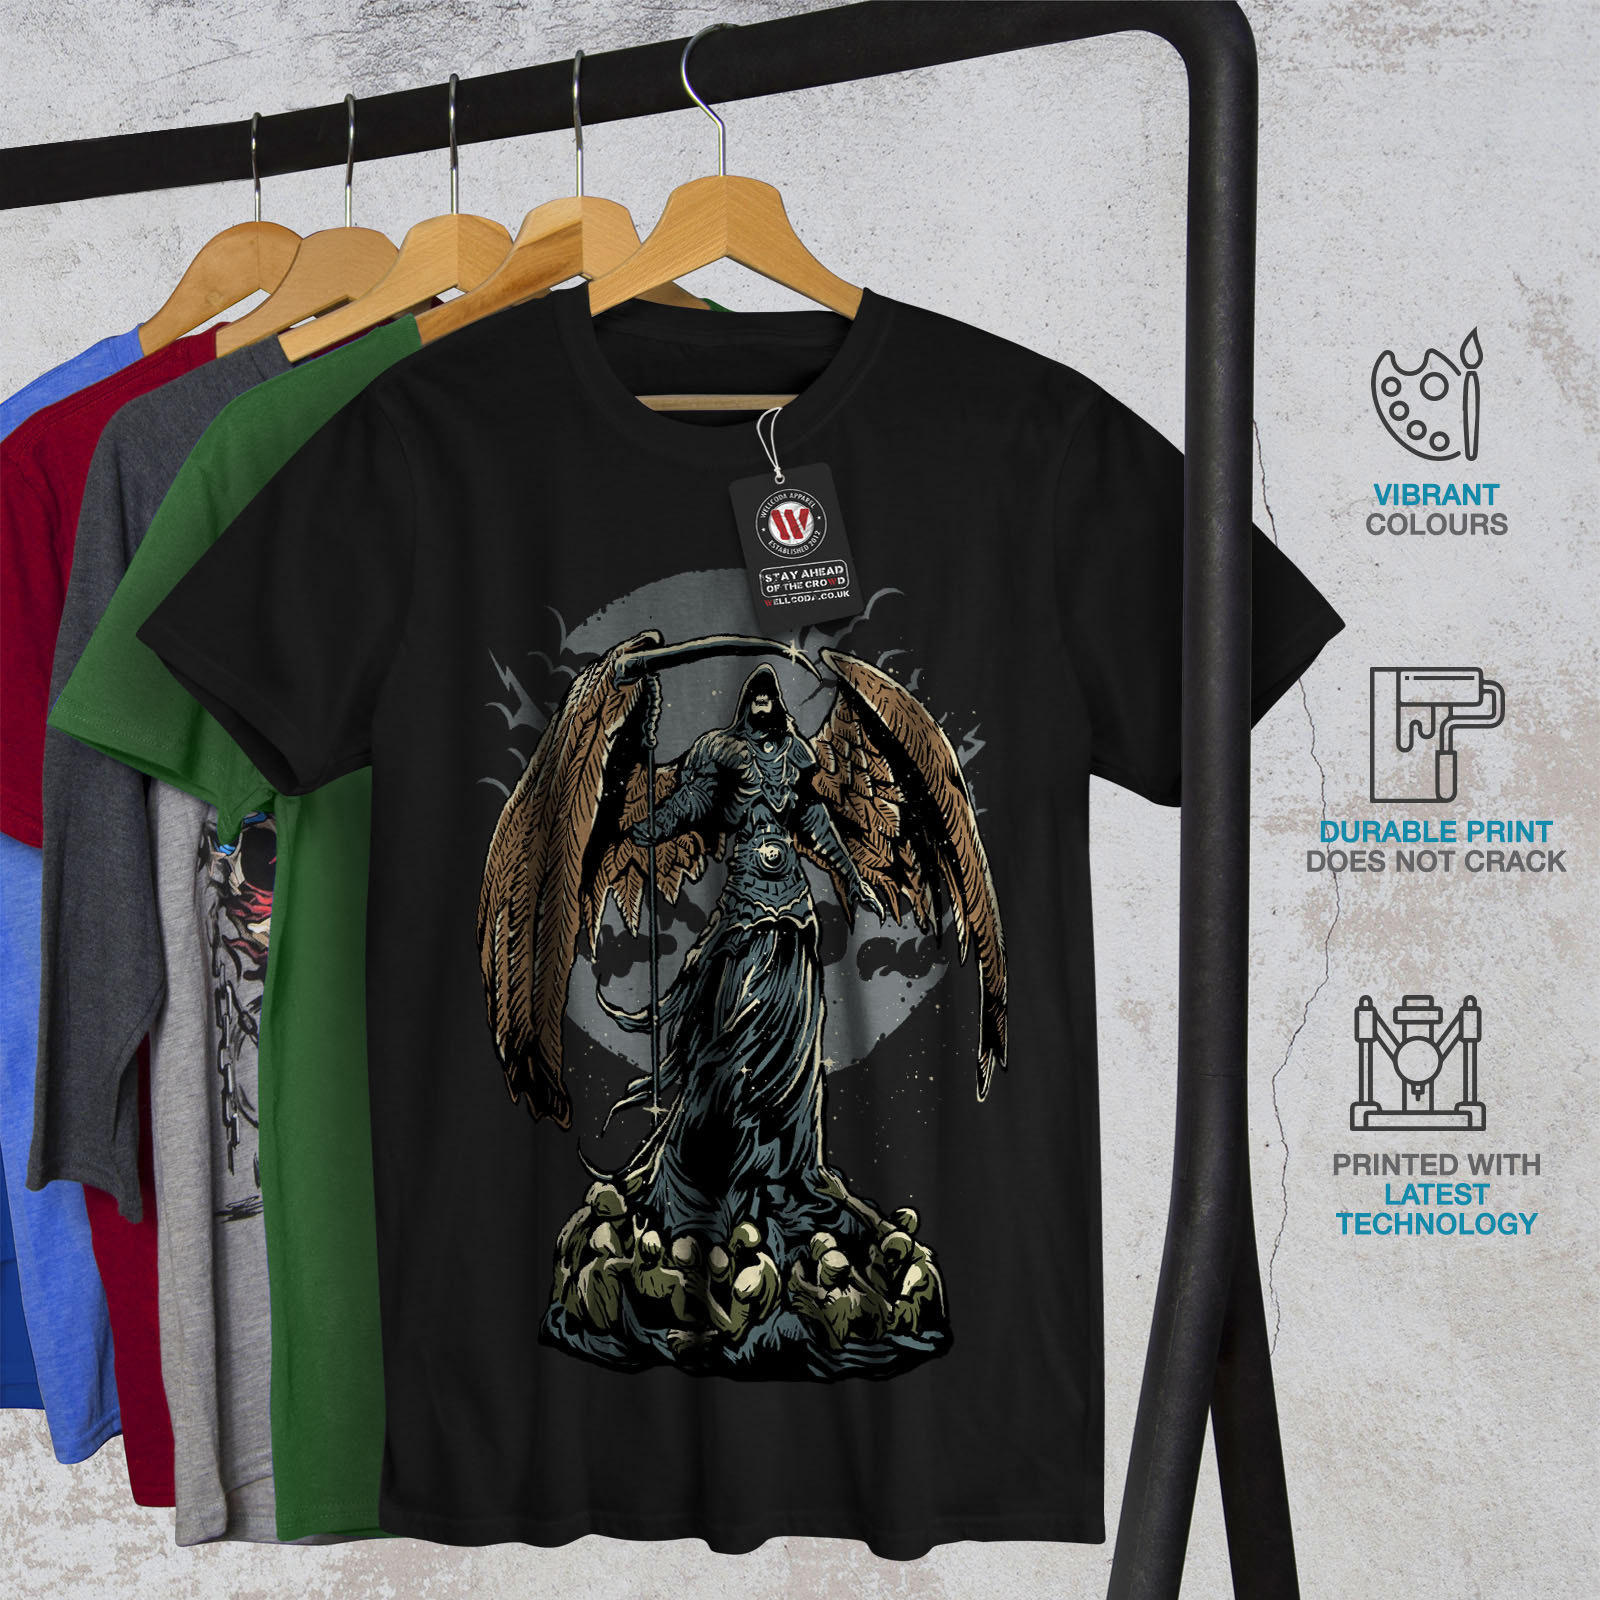 Wellcoda-Evil-Grim-Reaper-Mens-T-shirt-Horror-Graphic-Design-Printed-Tee thumbnail 6